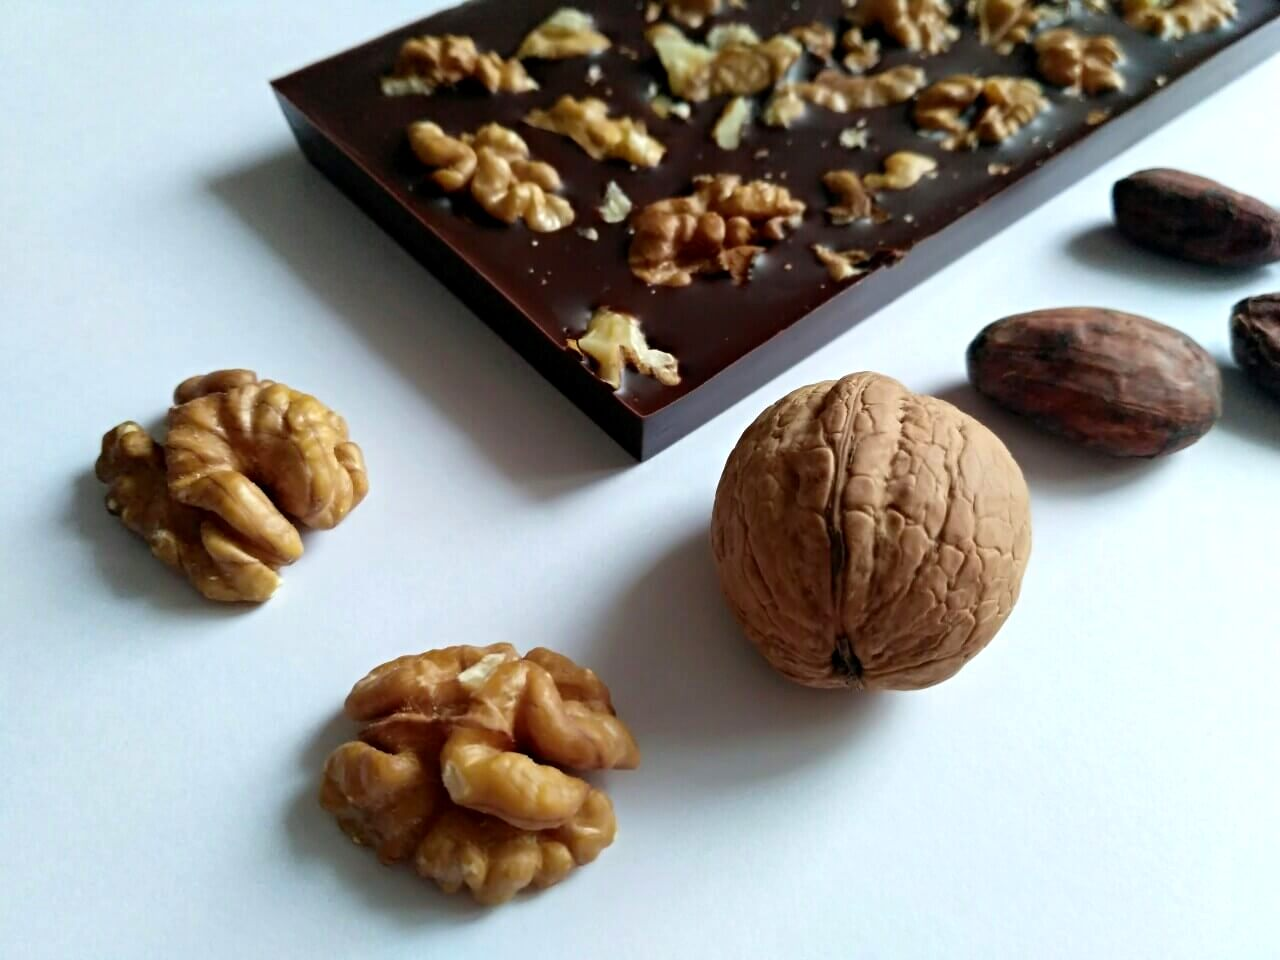 Шоколад семьи Азаровых